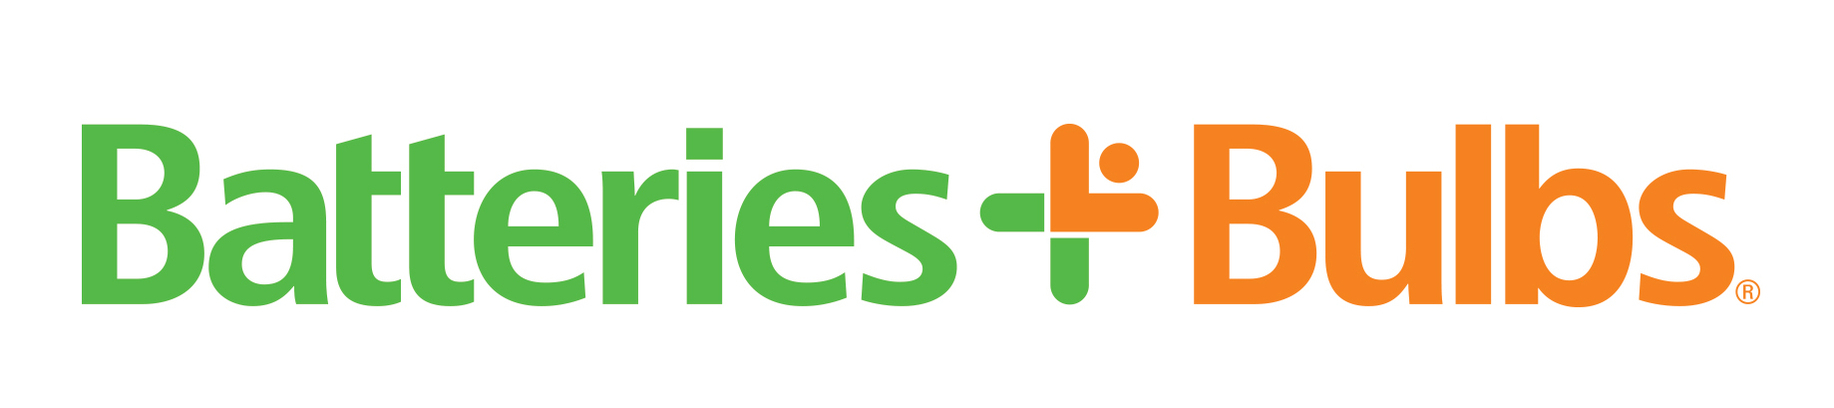 batteries plus logo